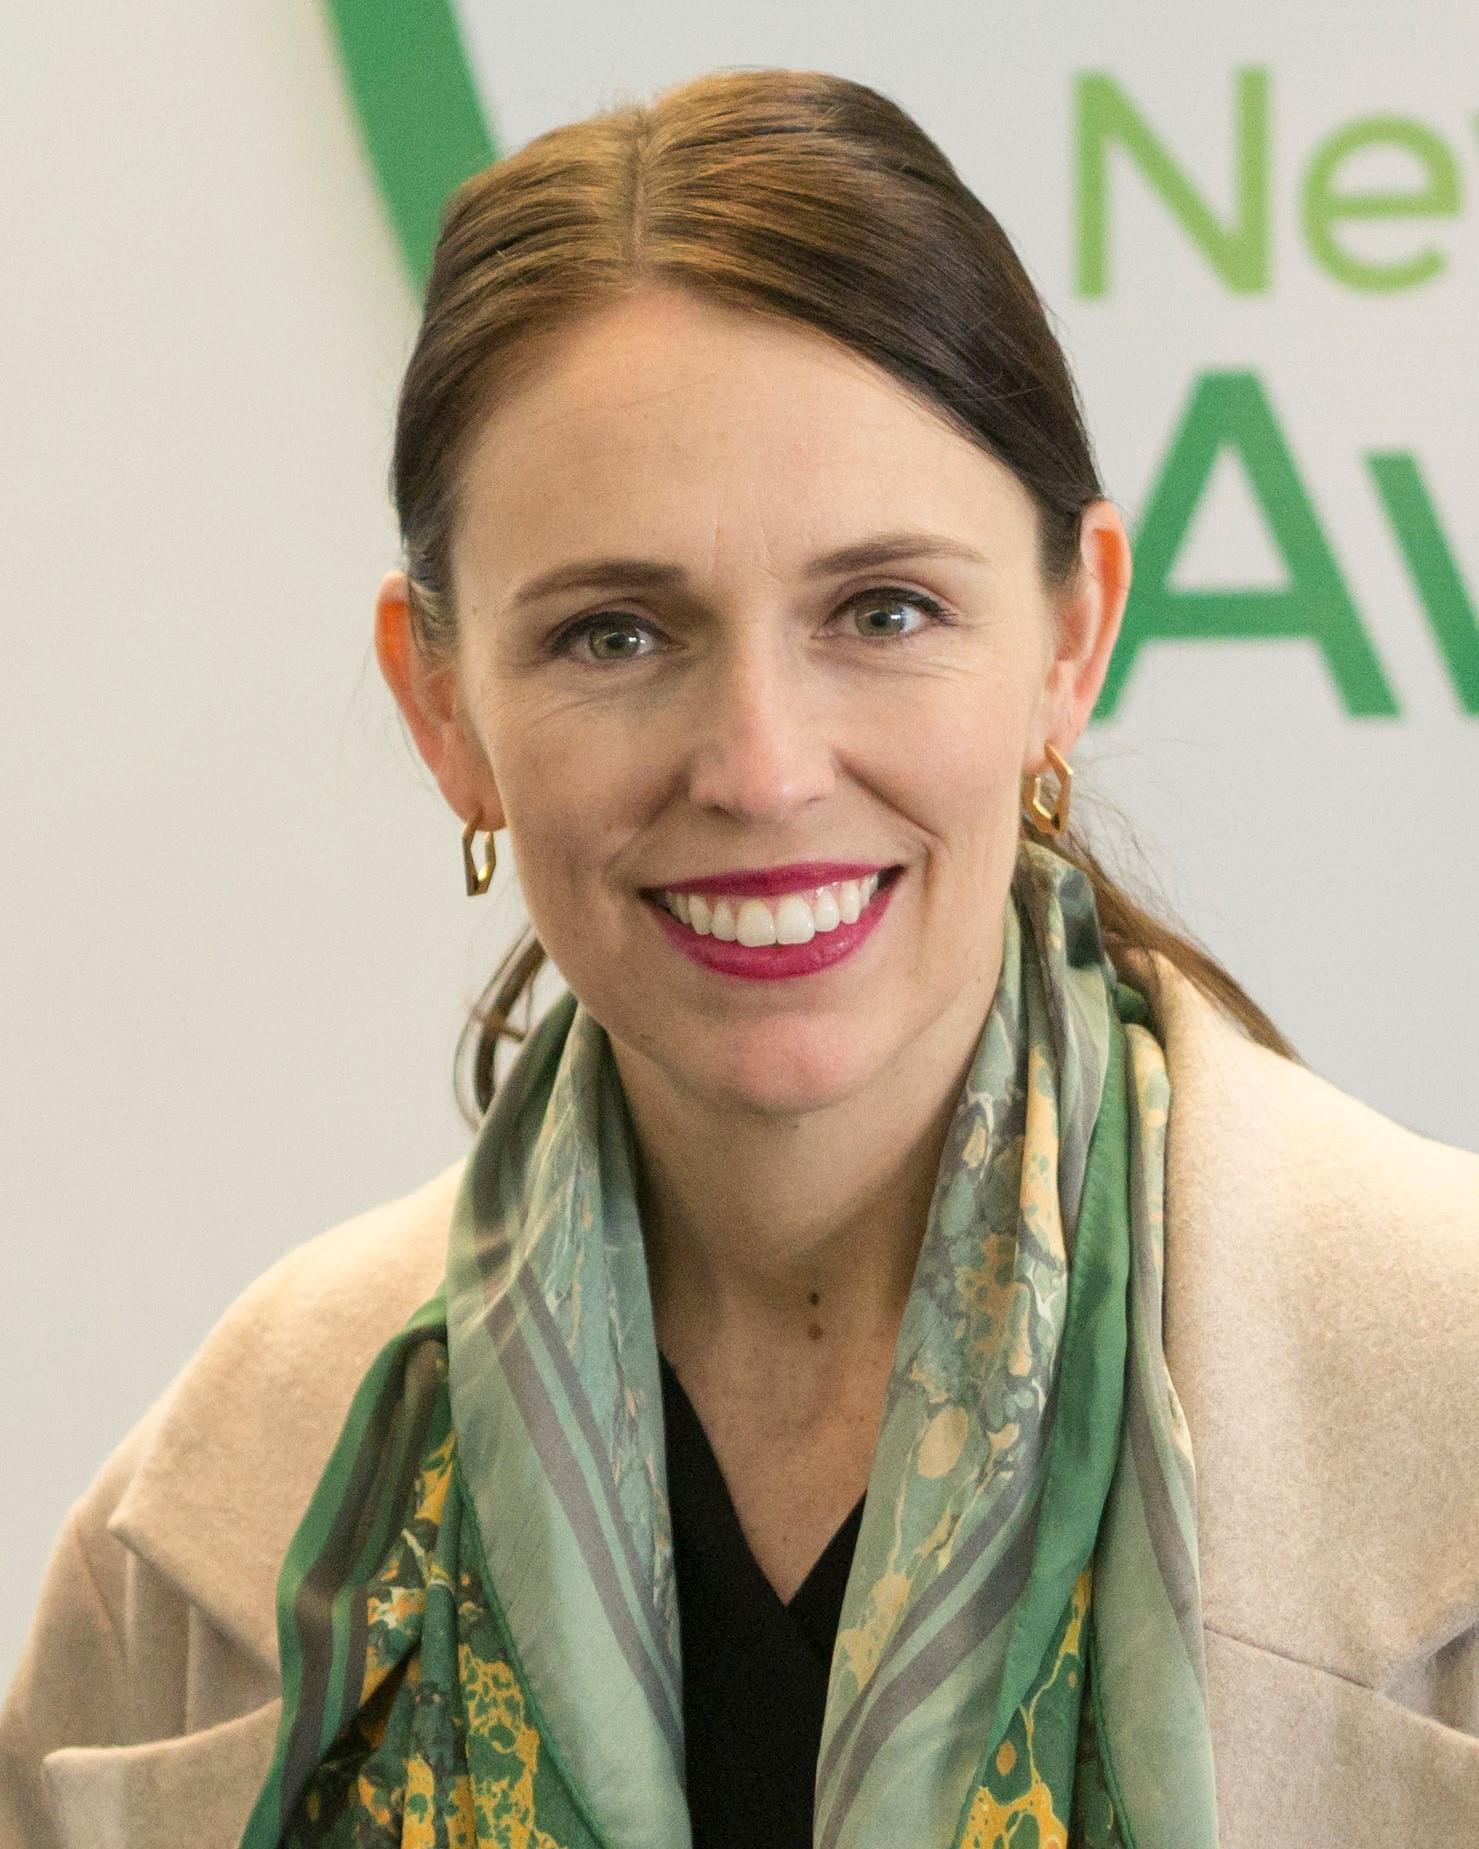 New Zealand Prime Minister, Jacinda Ardern